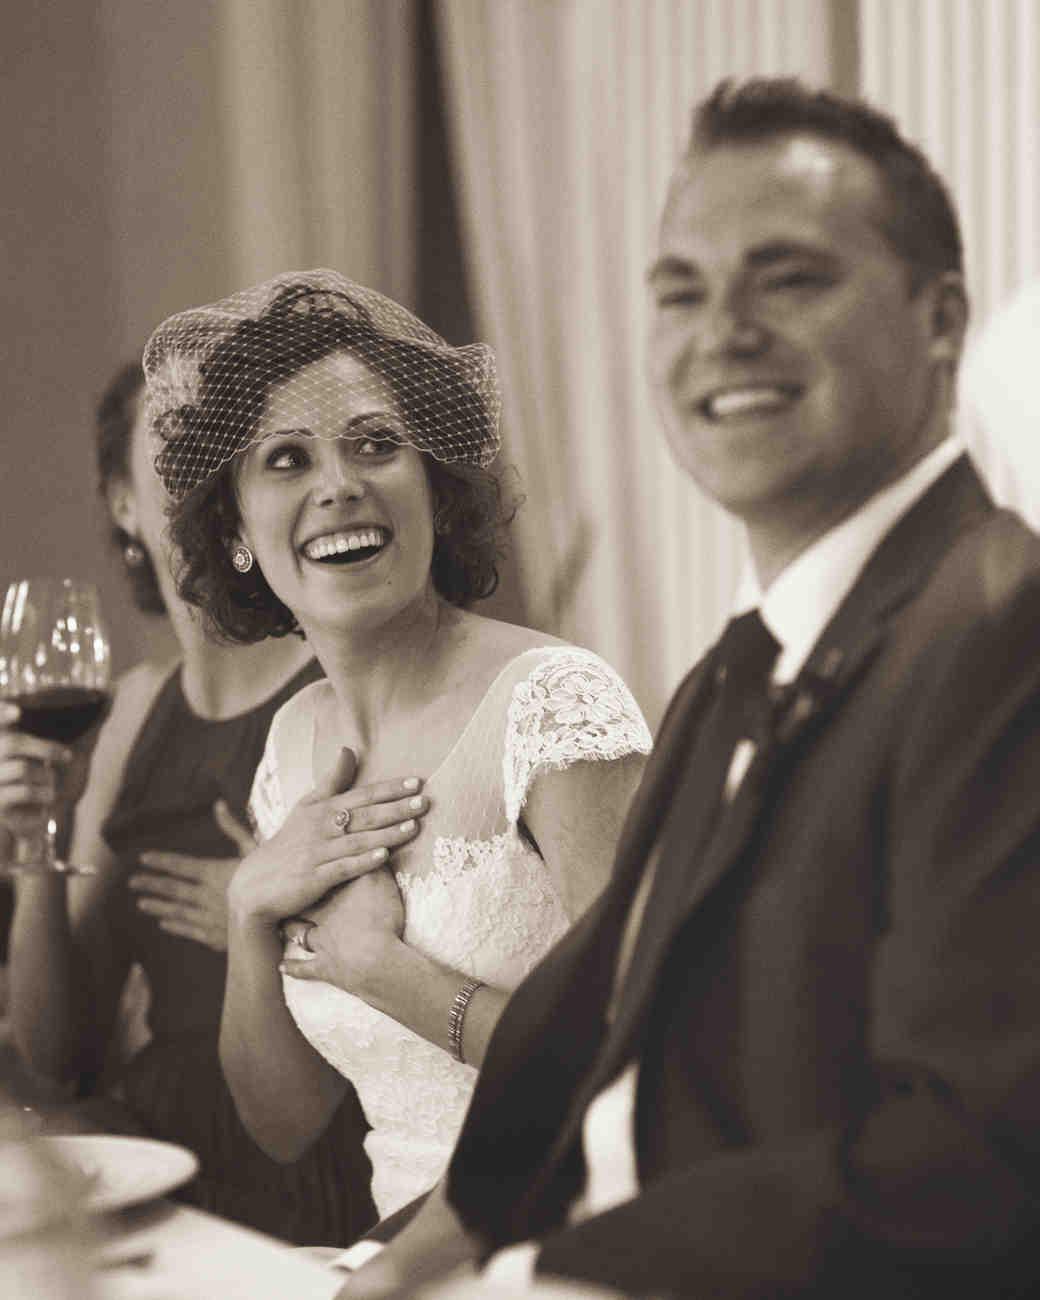 alix-bill-wedding-202-d111617195-comp-bw.jpg